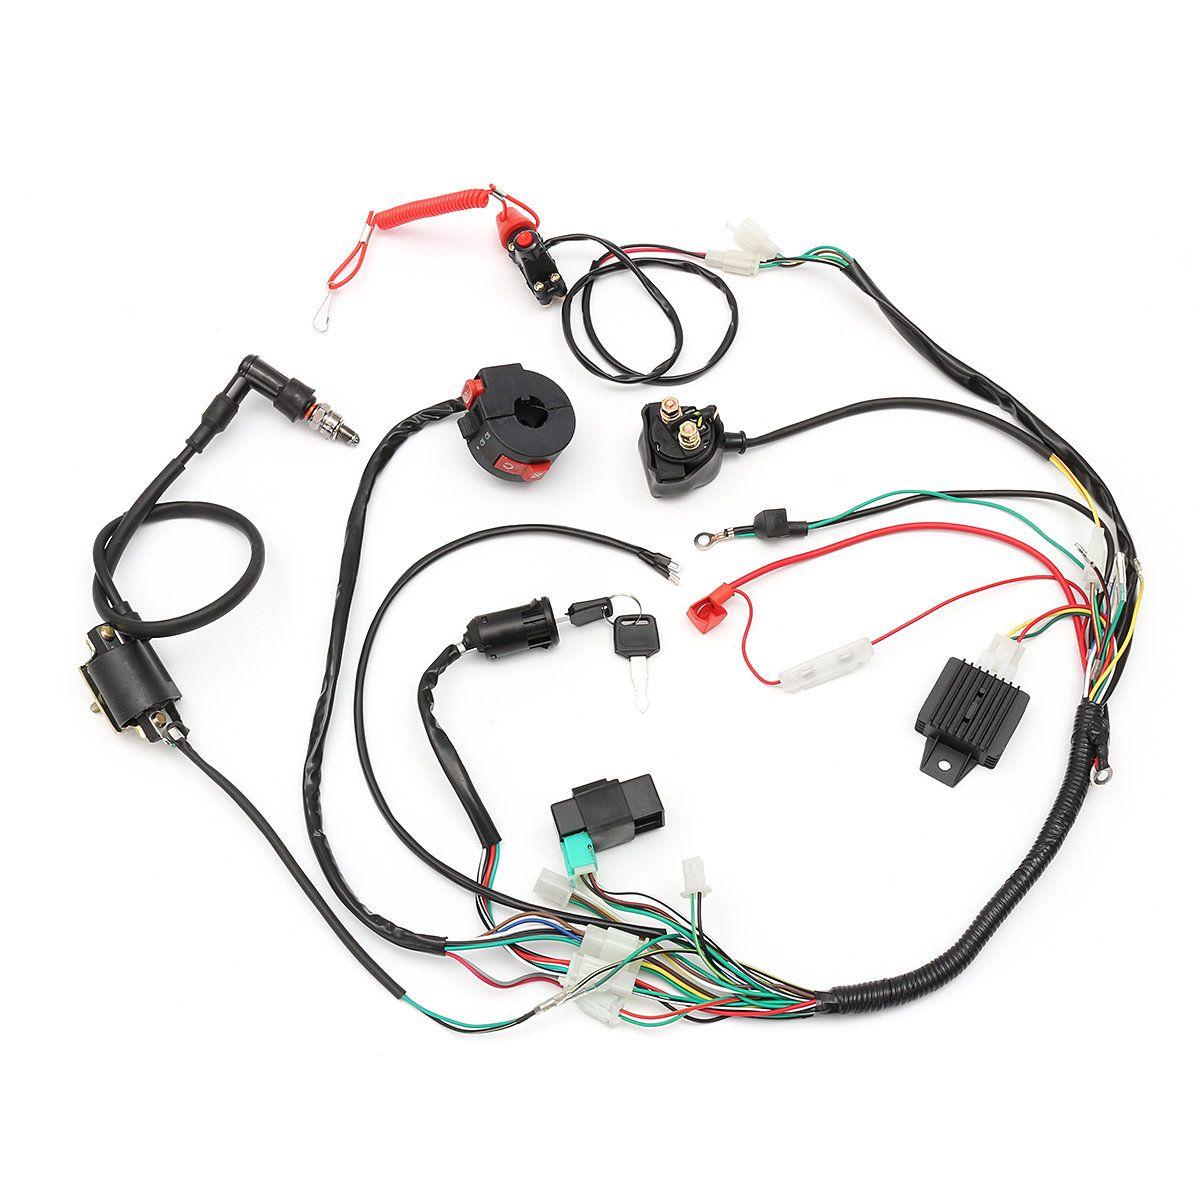 Wiring Harness Loom Solenoid Coil Rectifier CDI 50cc 70cc 110cc 125cc ATV  Quad Bike Go Kart